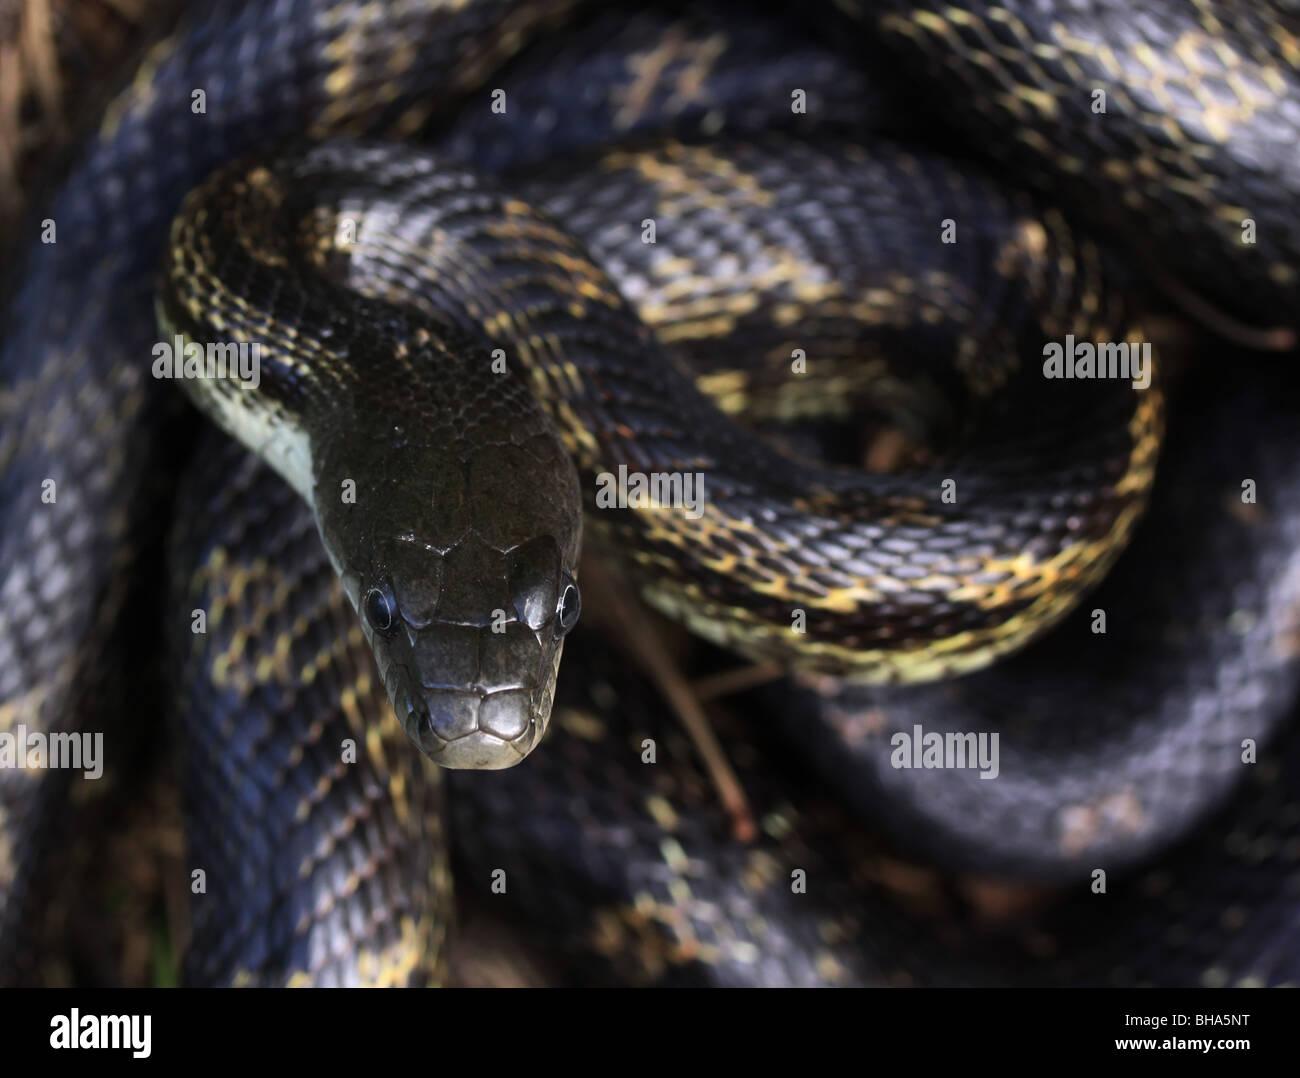 tongue black rat snake smell - Stock Image